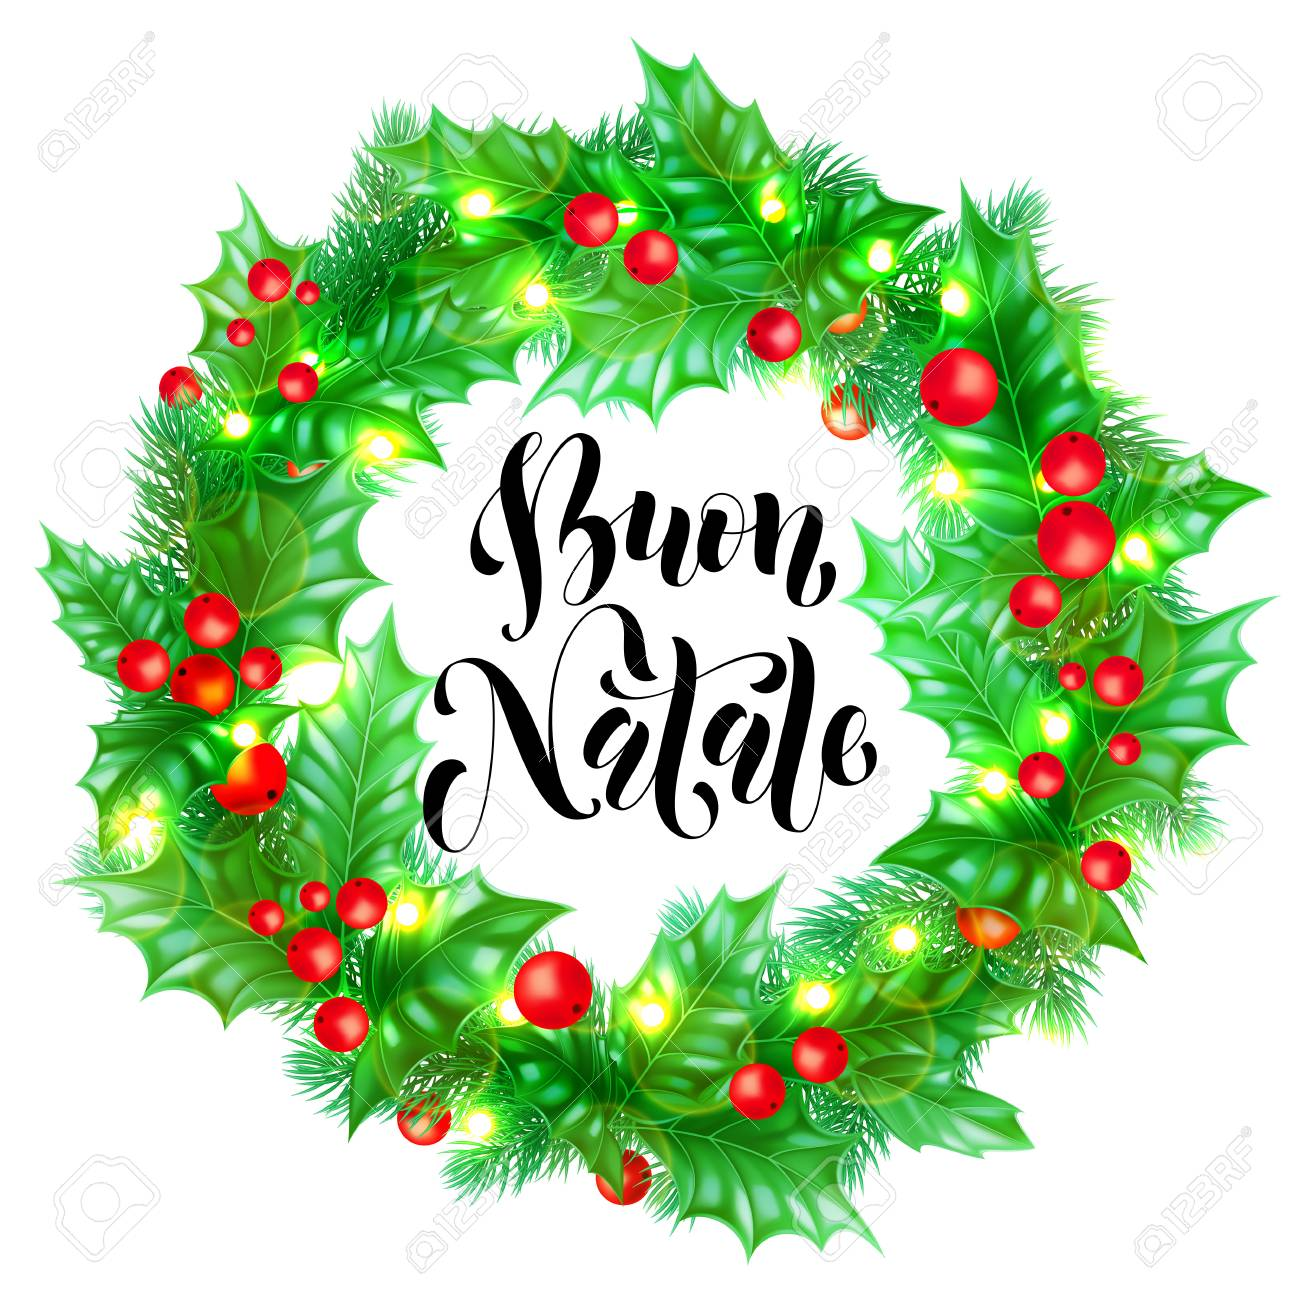 Immagini Natale Free.Buon Natale Italian Merry Christmas Holiday Hand Drawn Calligraphy